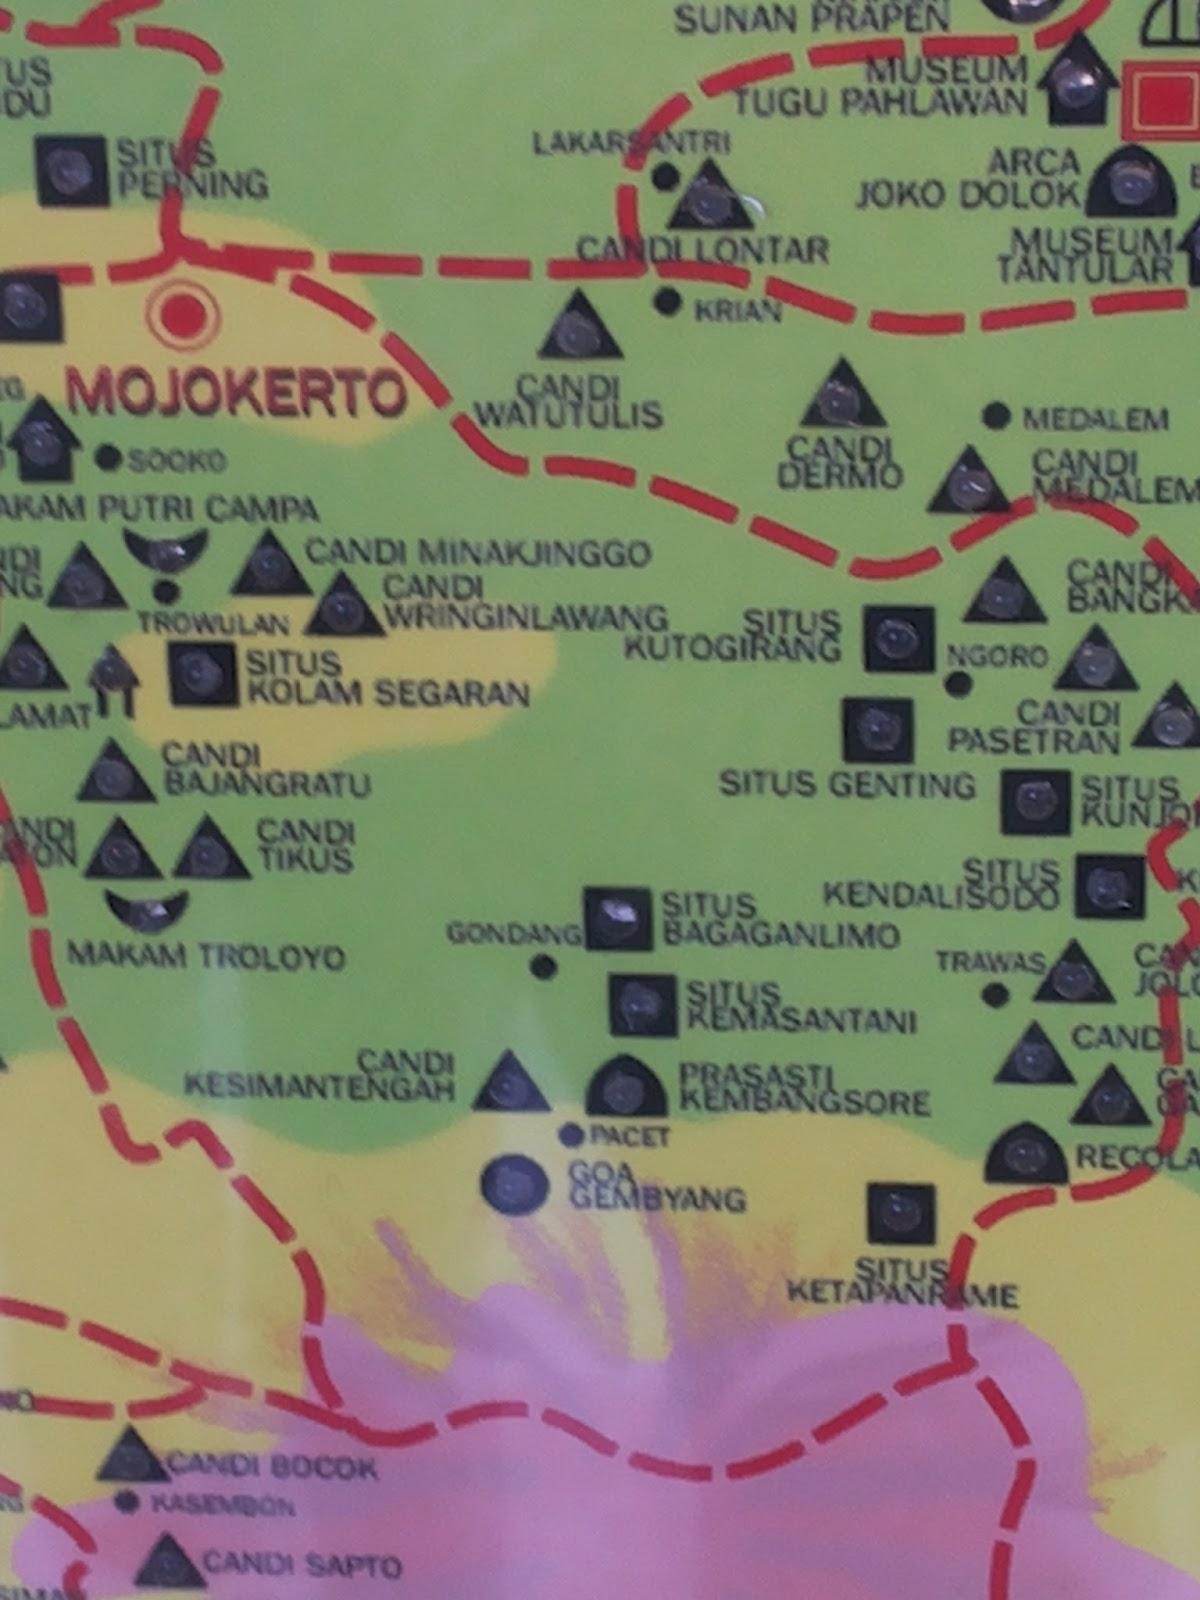 Homeland Tempat Wisata Kotaku Mojokerto 1 Berbagai Situs Candi Peninggalan